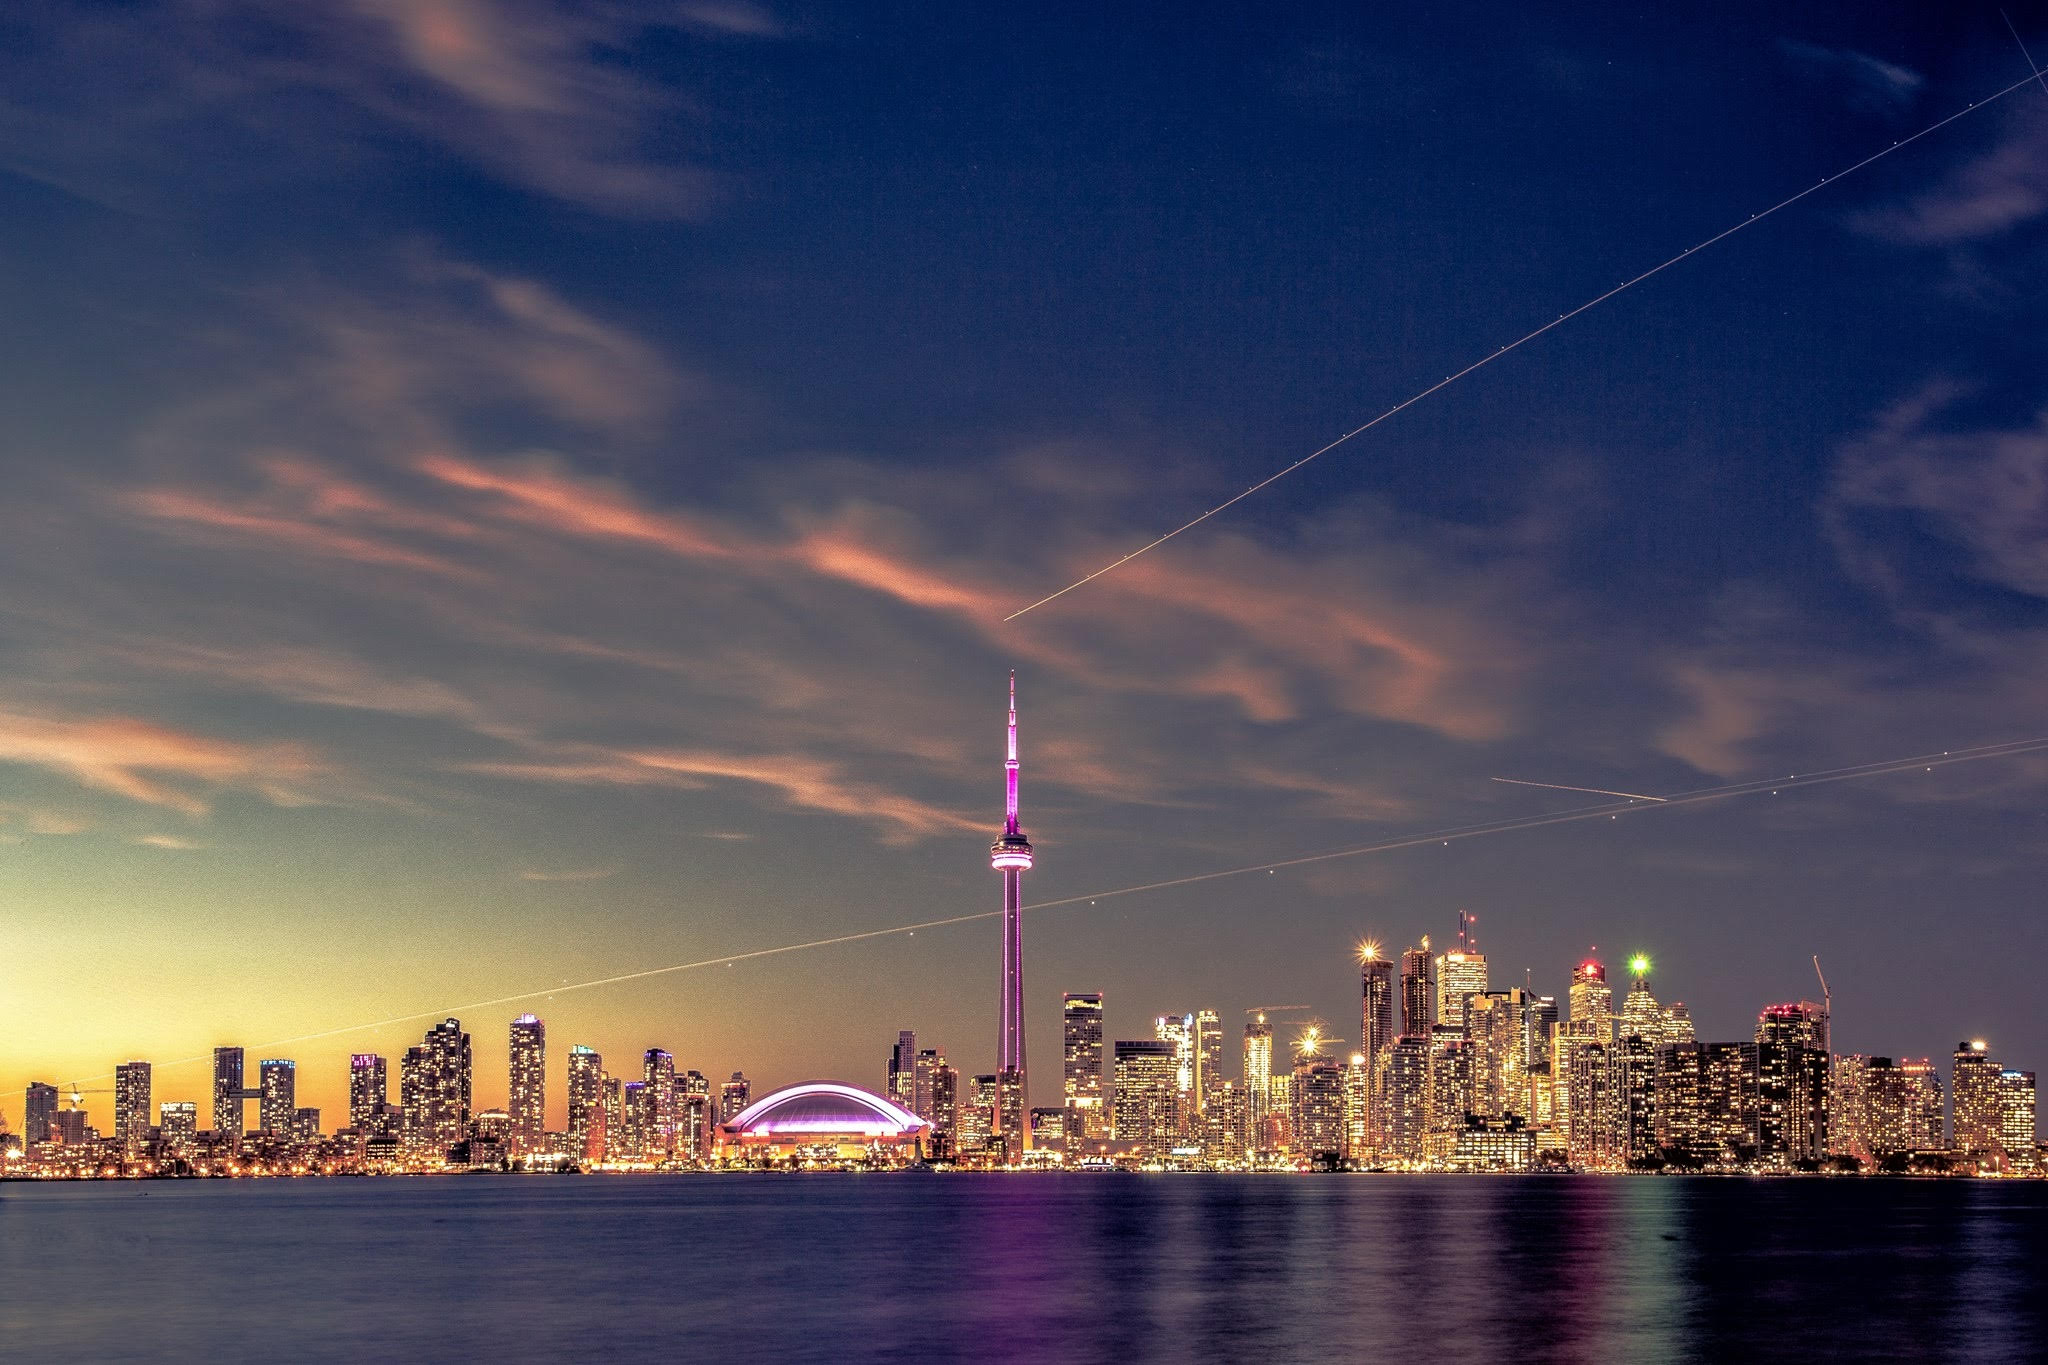 Toronto downtown night view